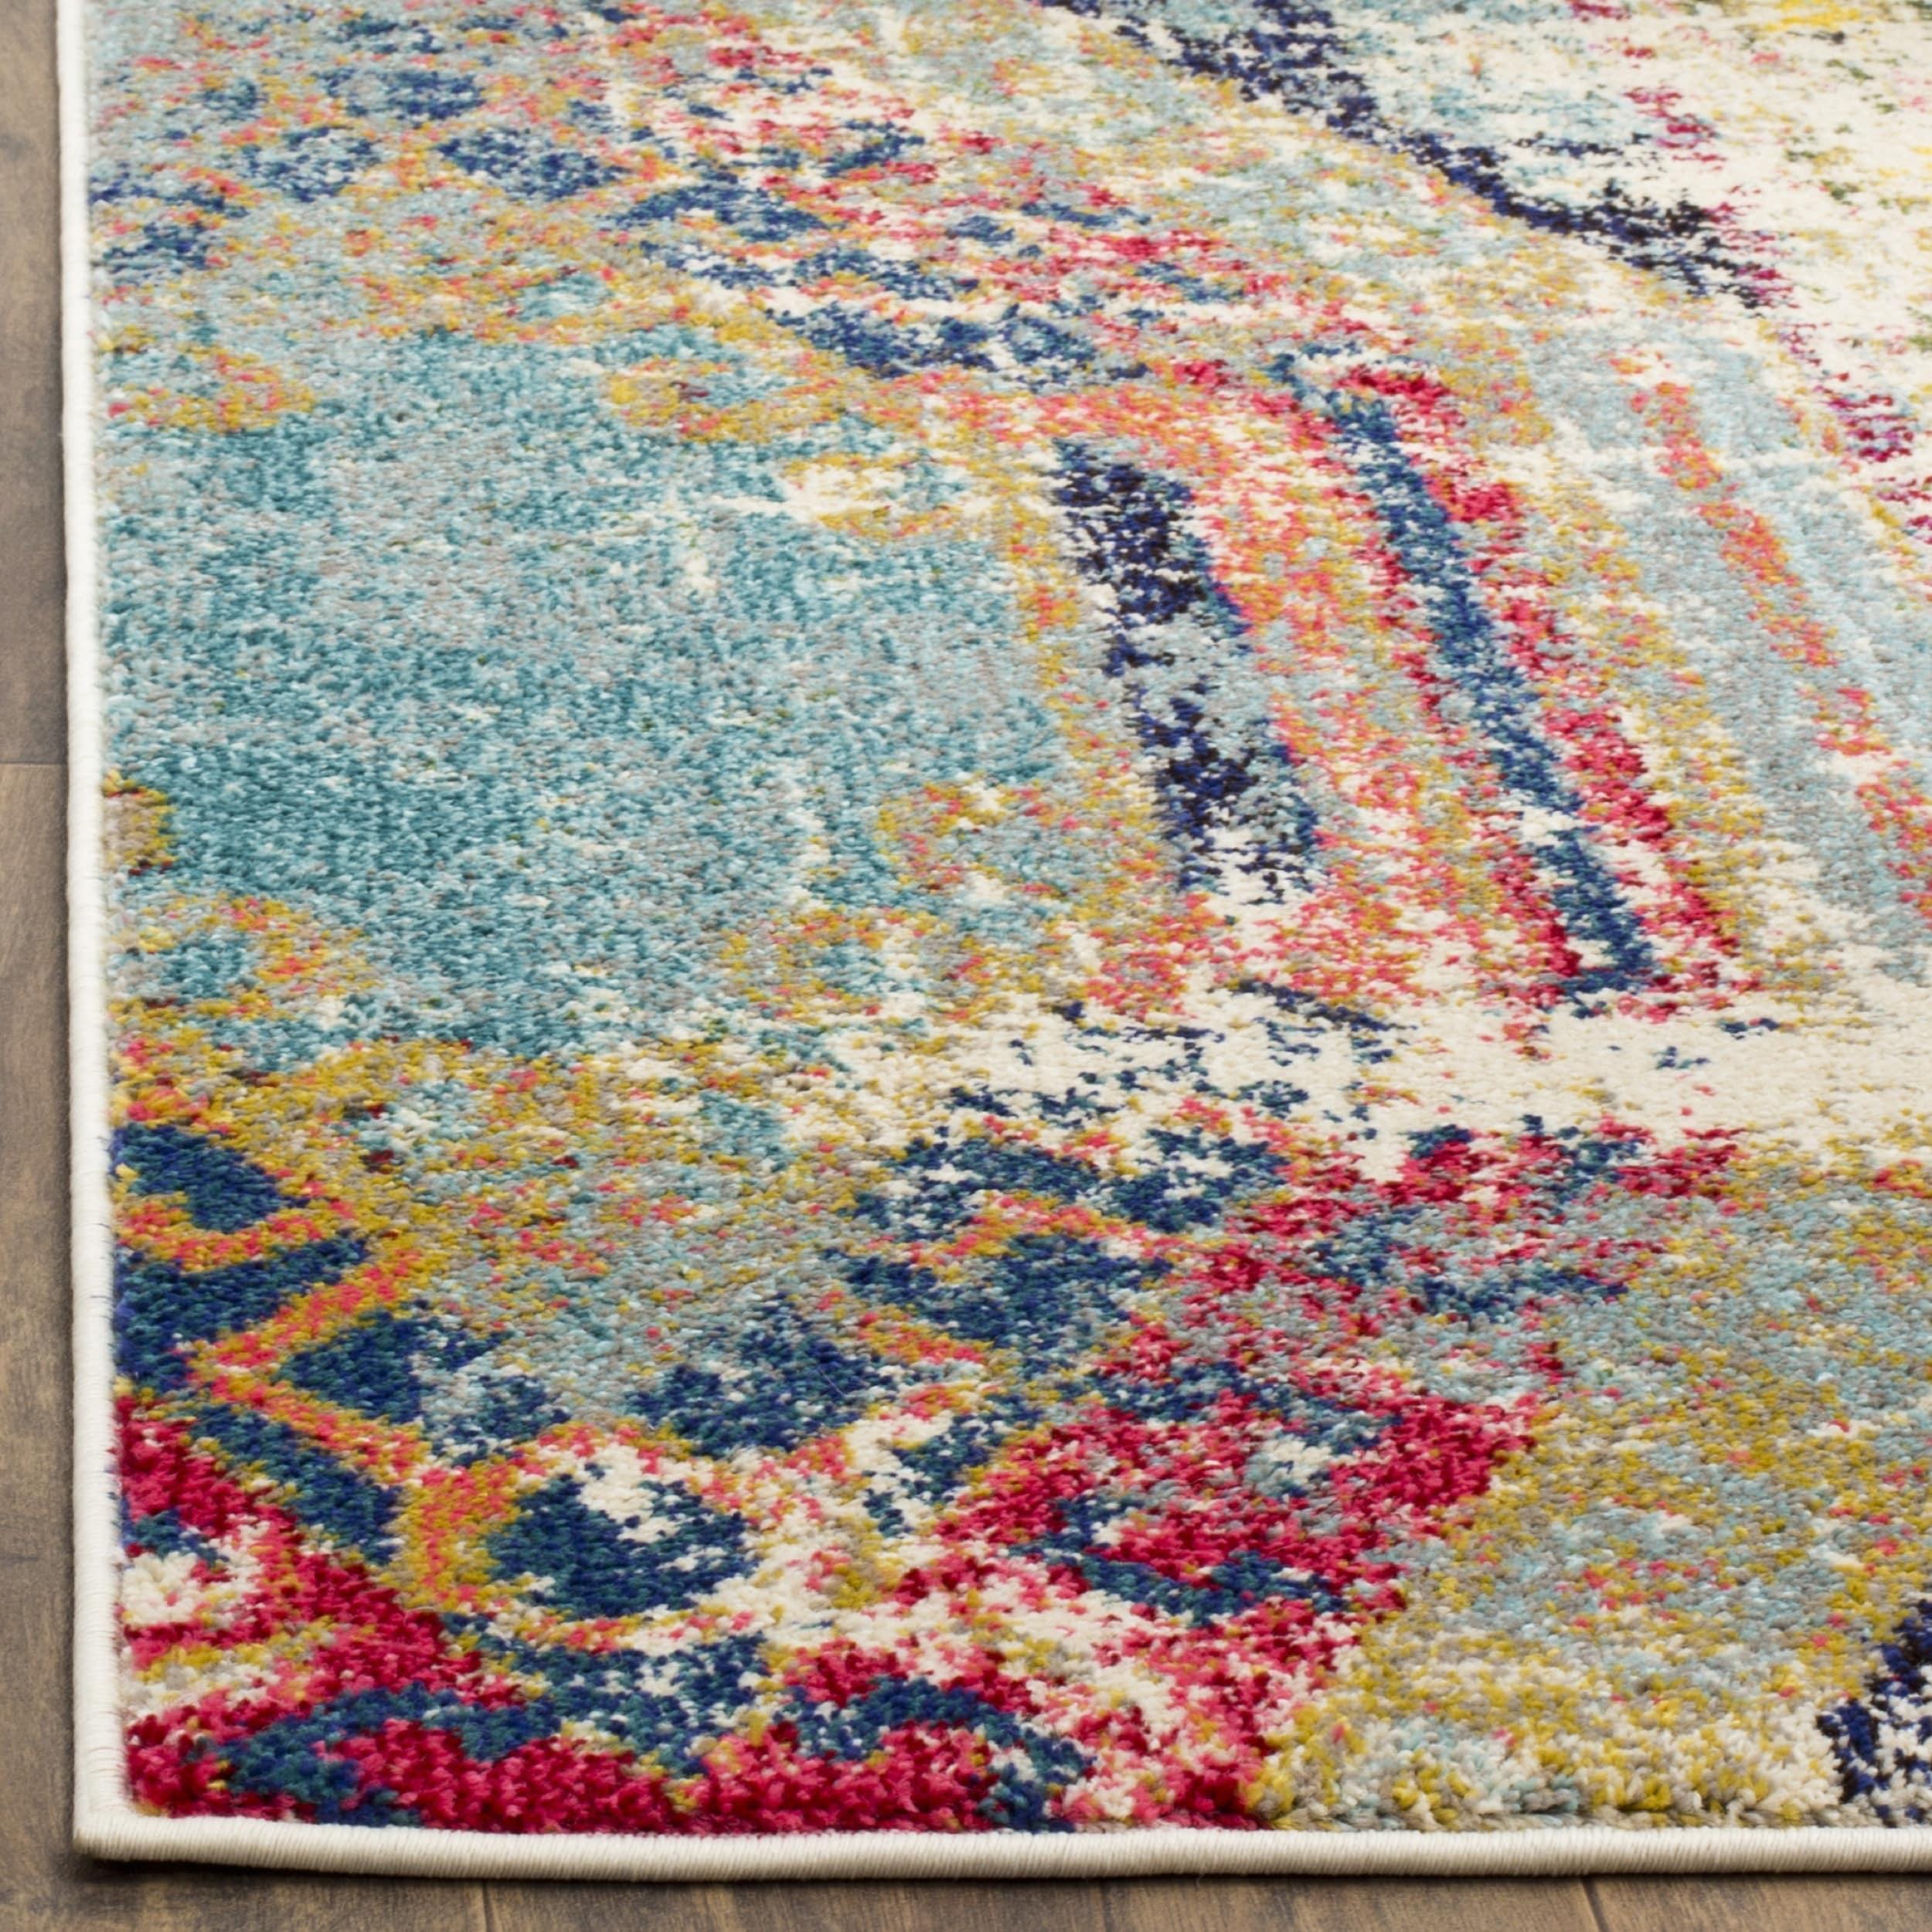 vintage rug pastel fullxfull small aztec turkish runner rugaztec bohemian p il fashion oushak